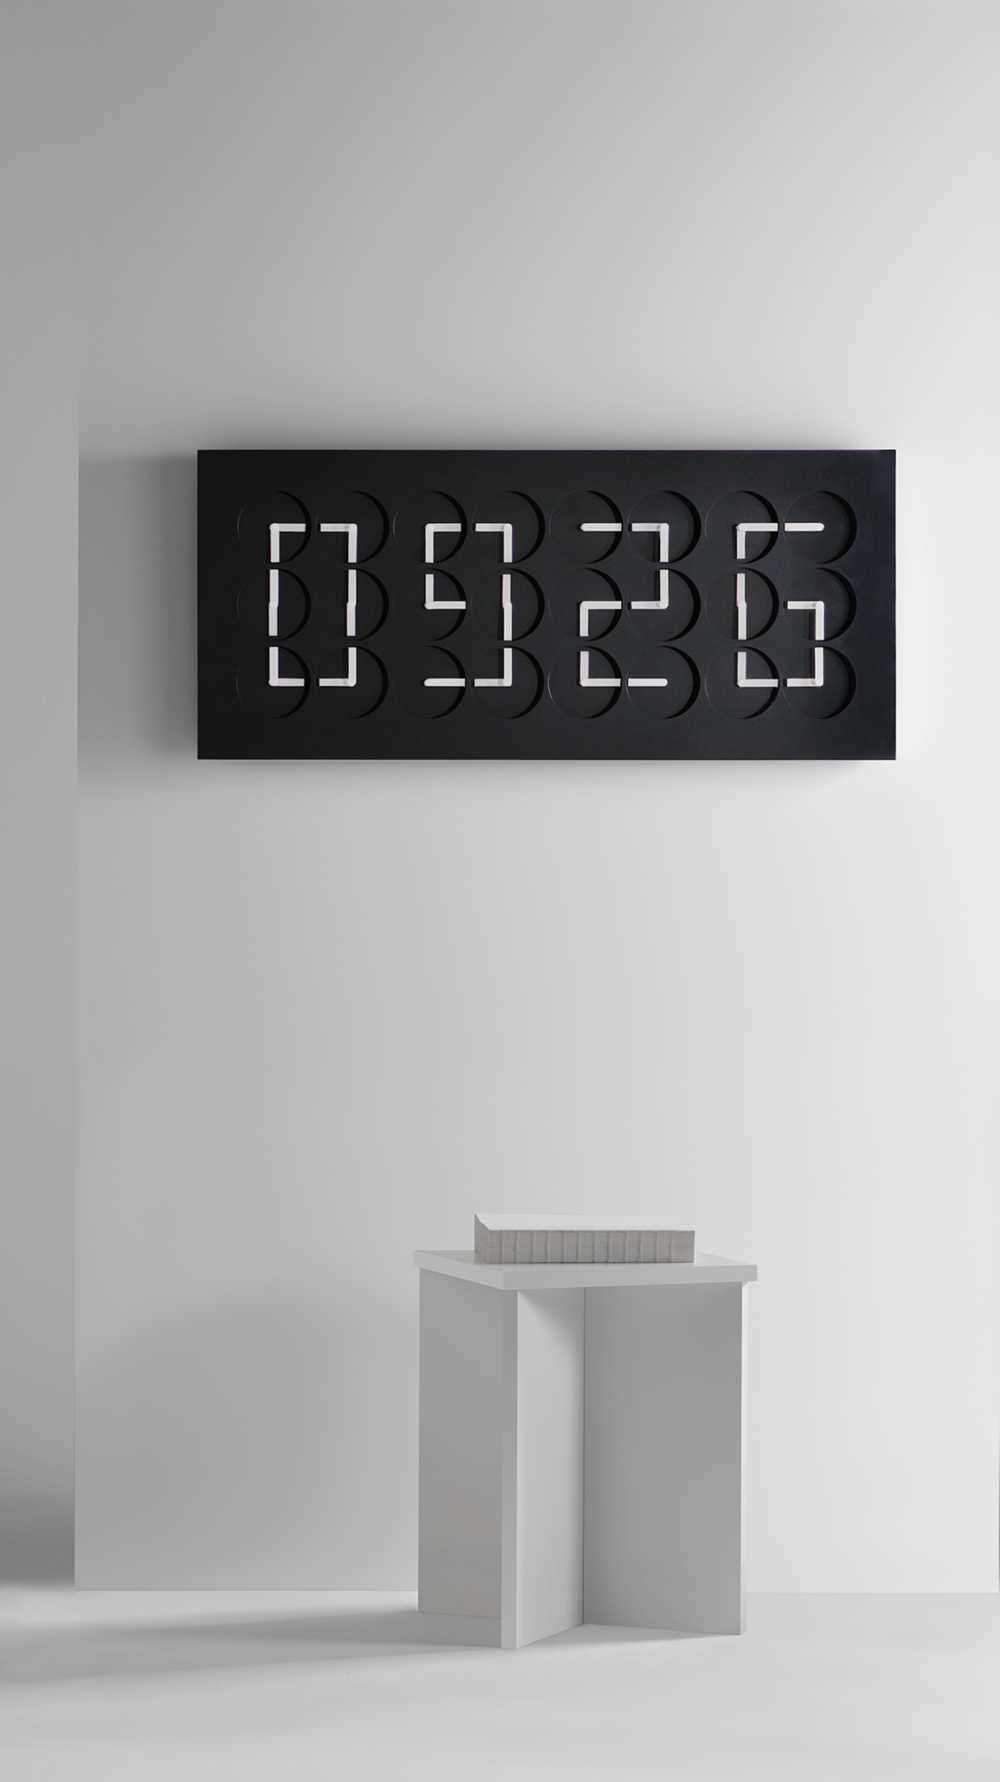 ClockClock 24 by Humans since 1982, Stockholm 2017.